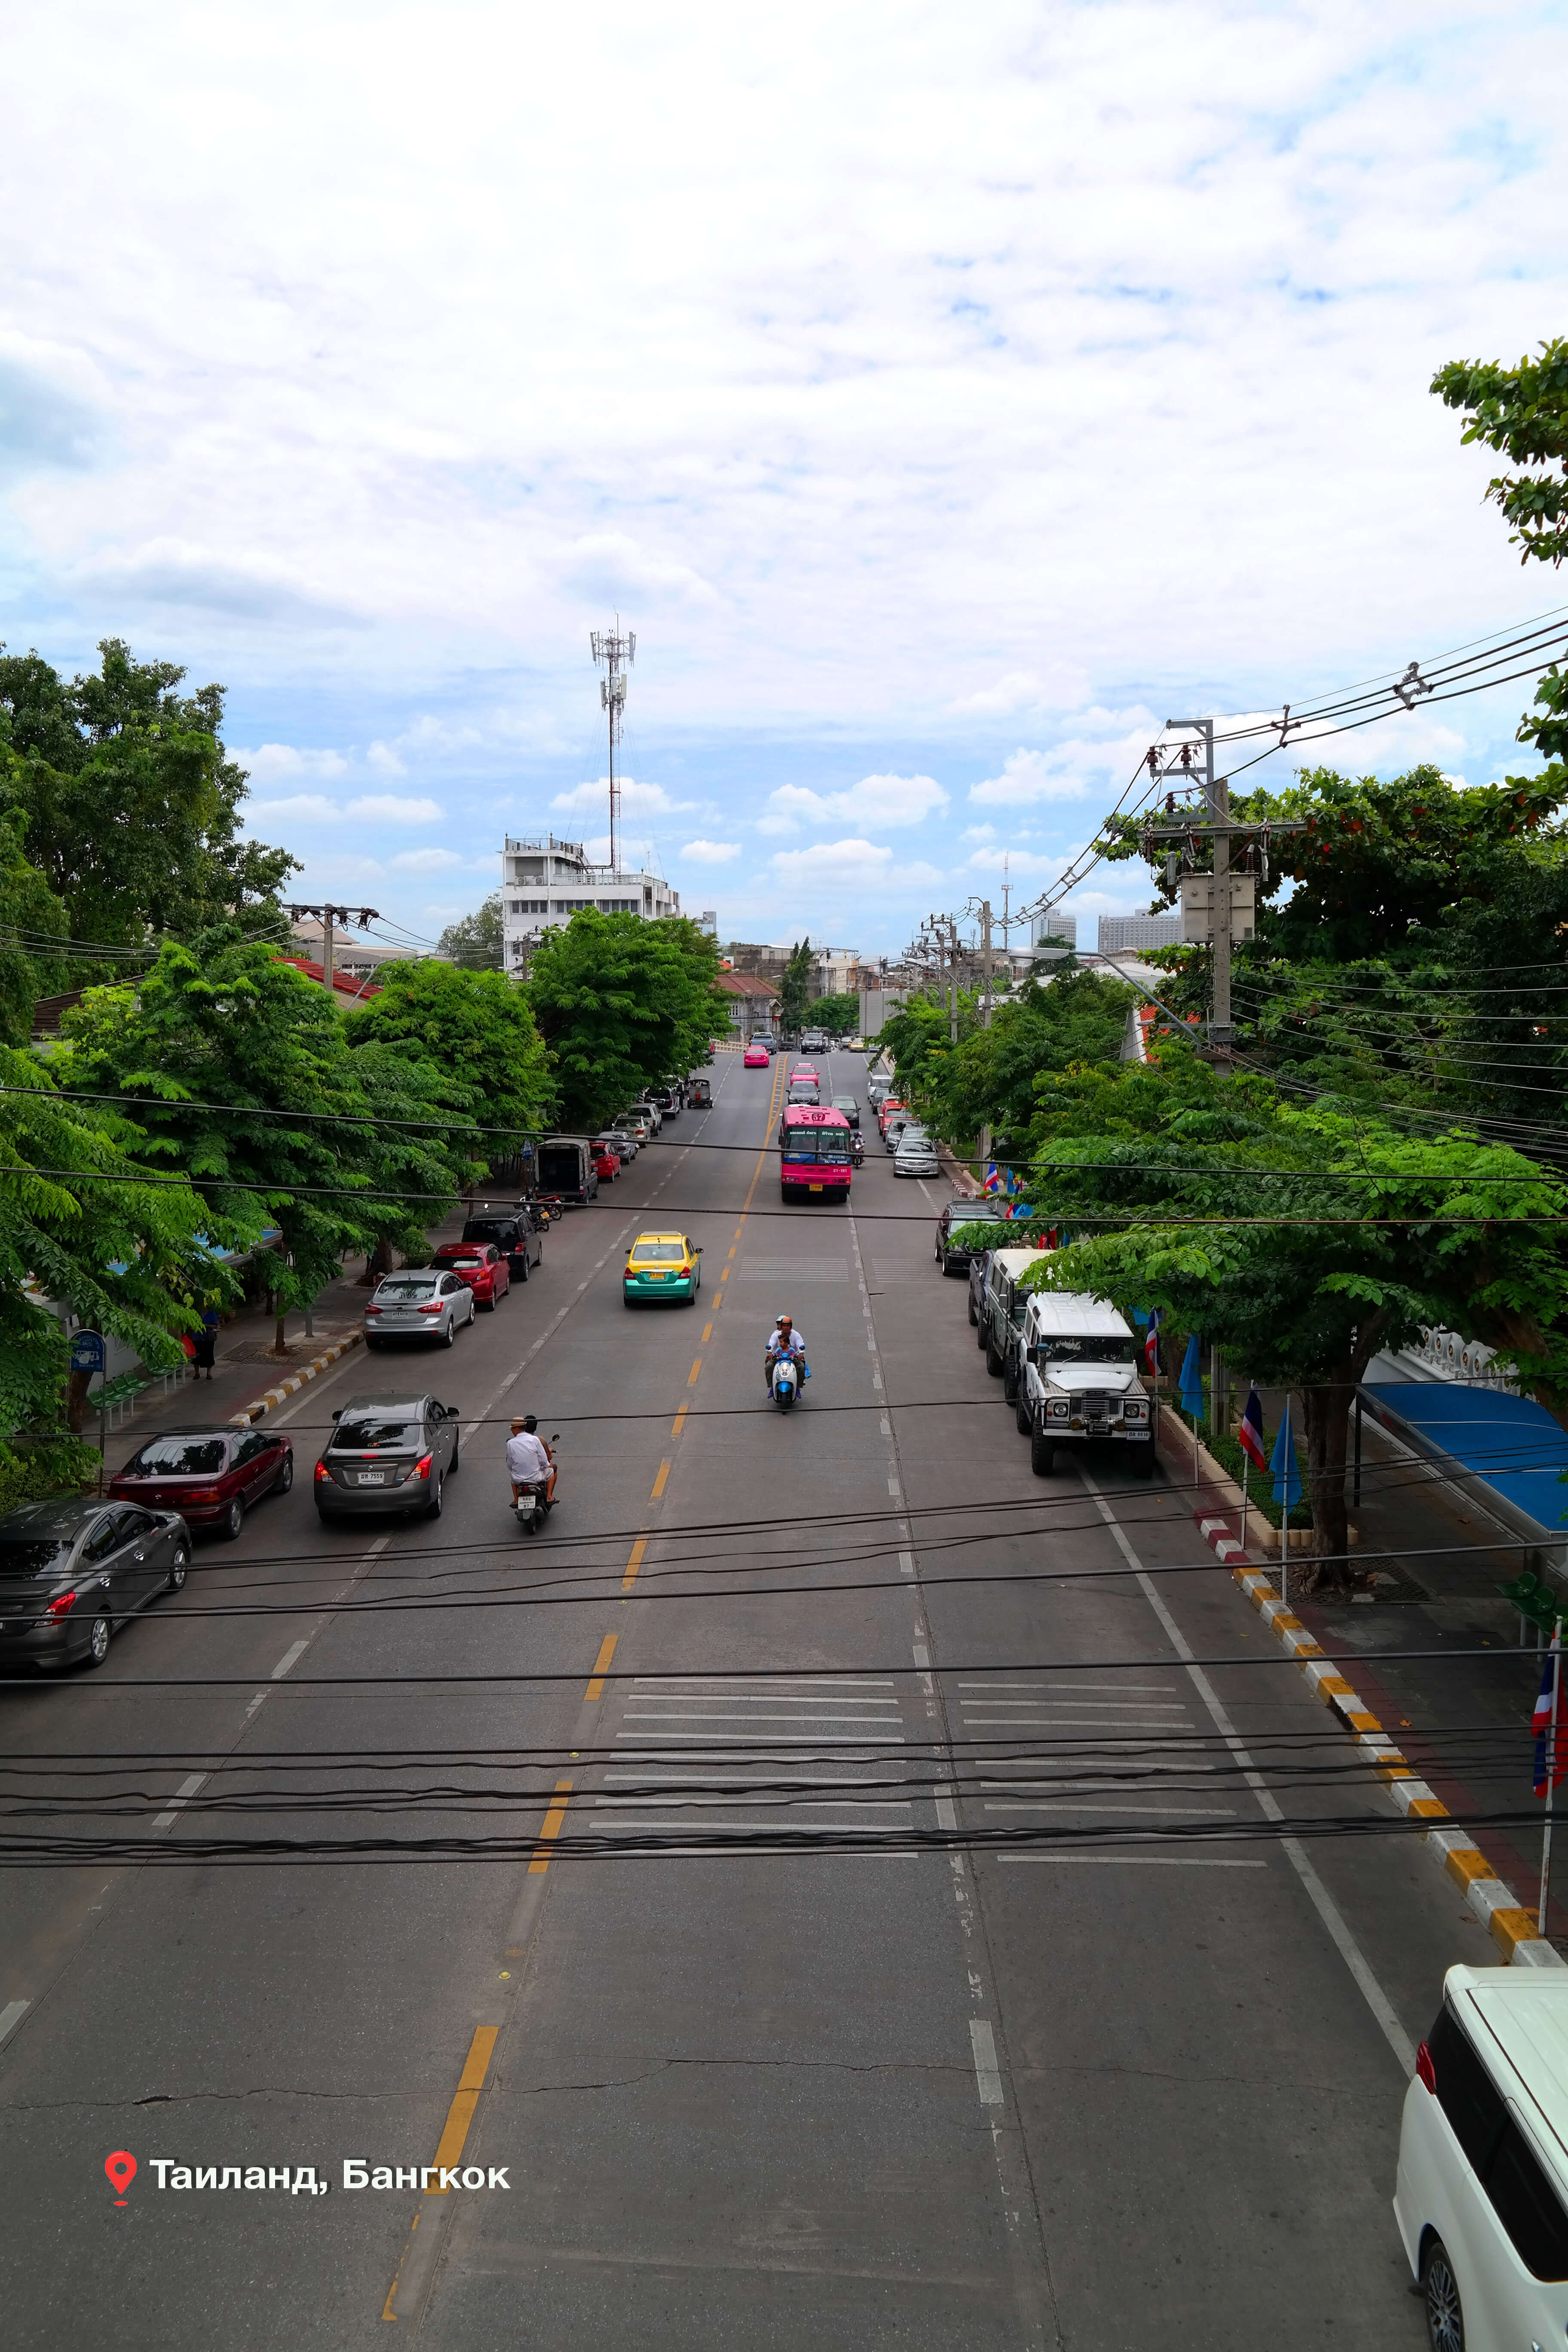 Транспорт в Таиланде, улица Бангкока.